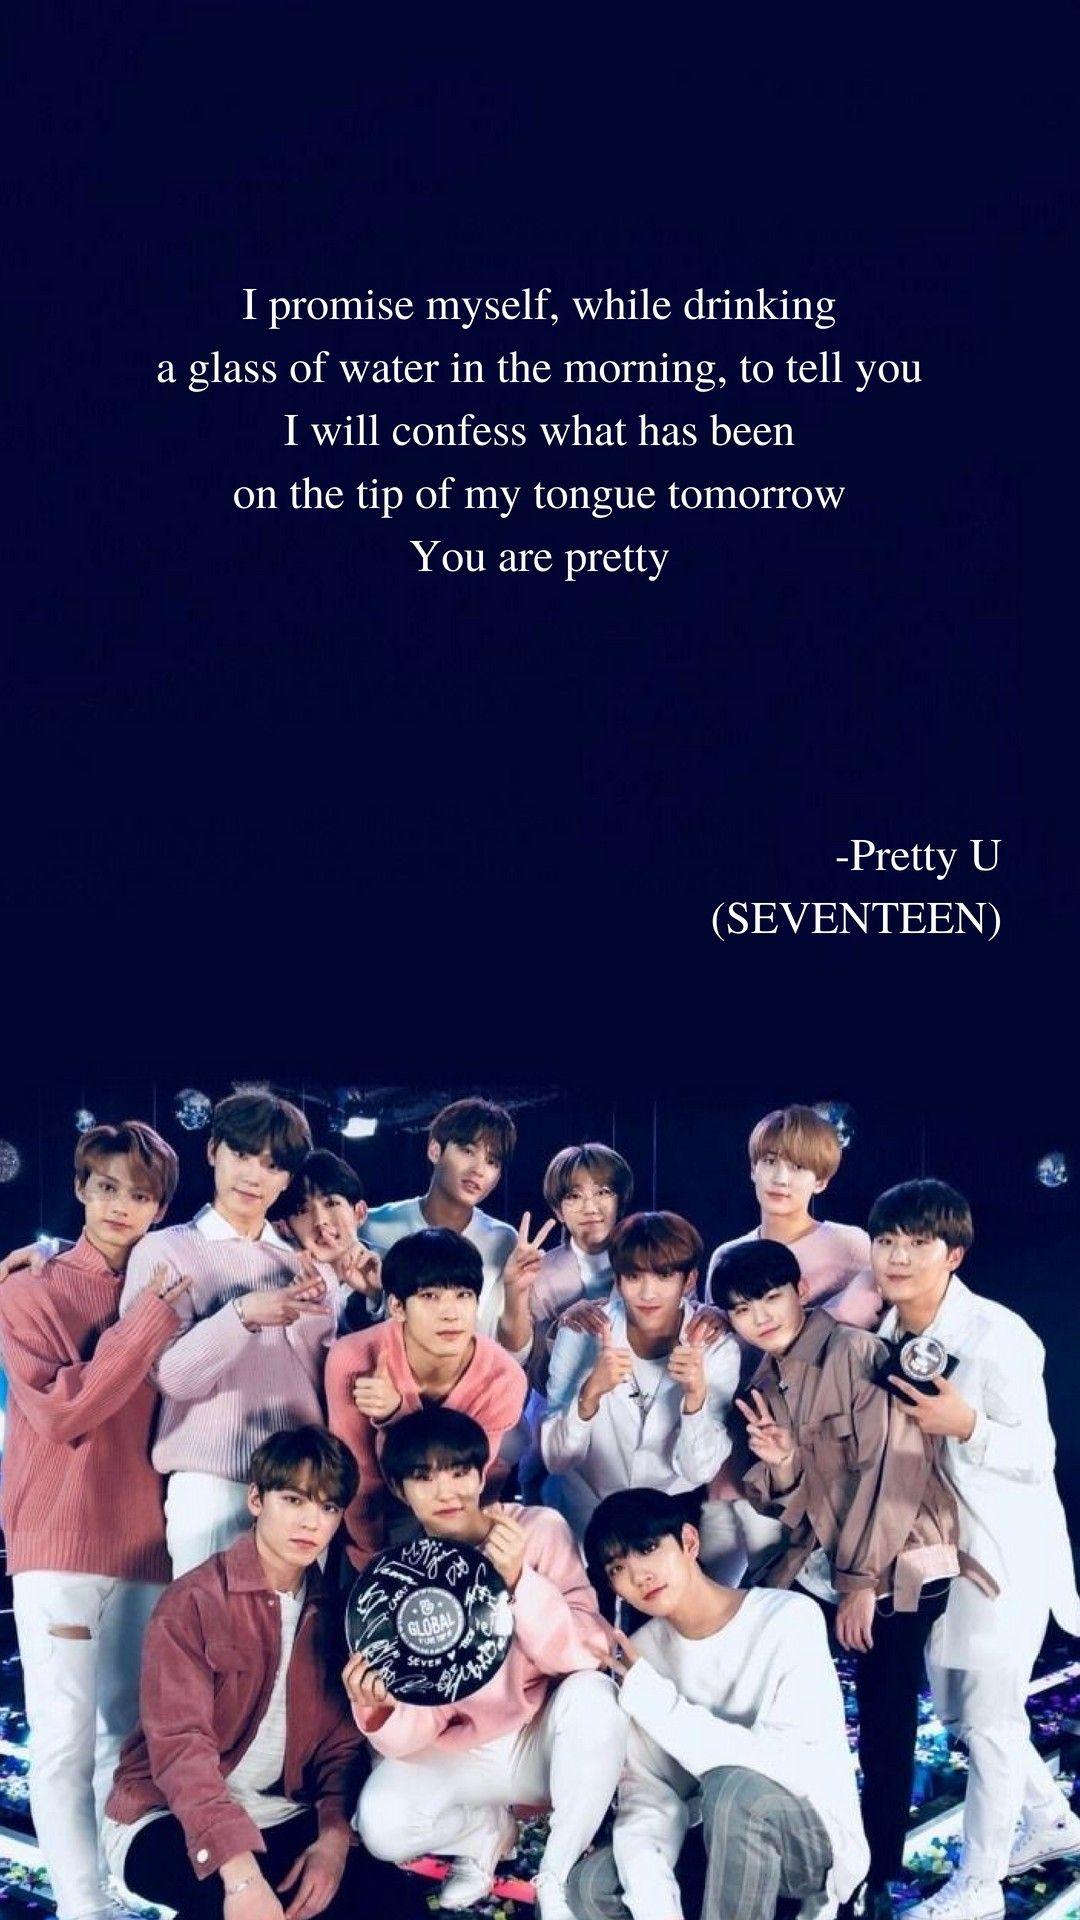 pretty u by seventeen lyrics kutipan lagu lirik lagu